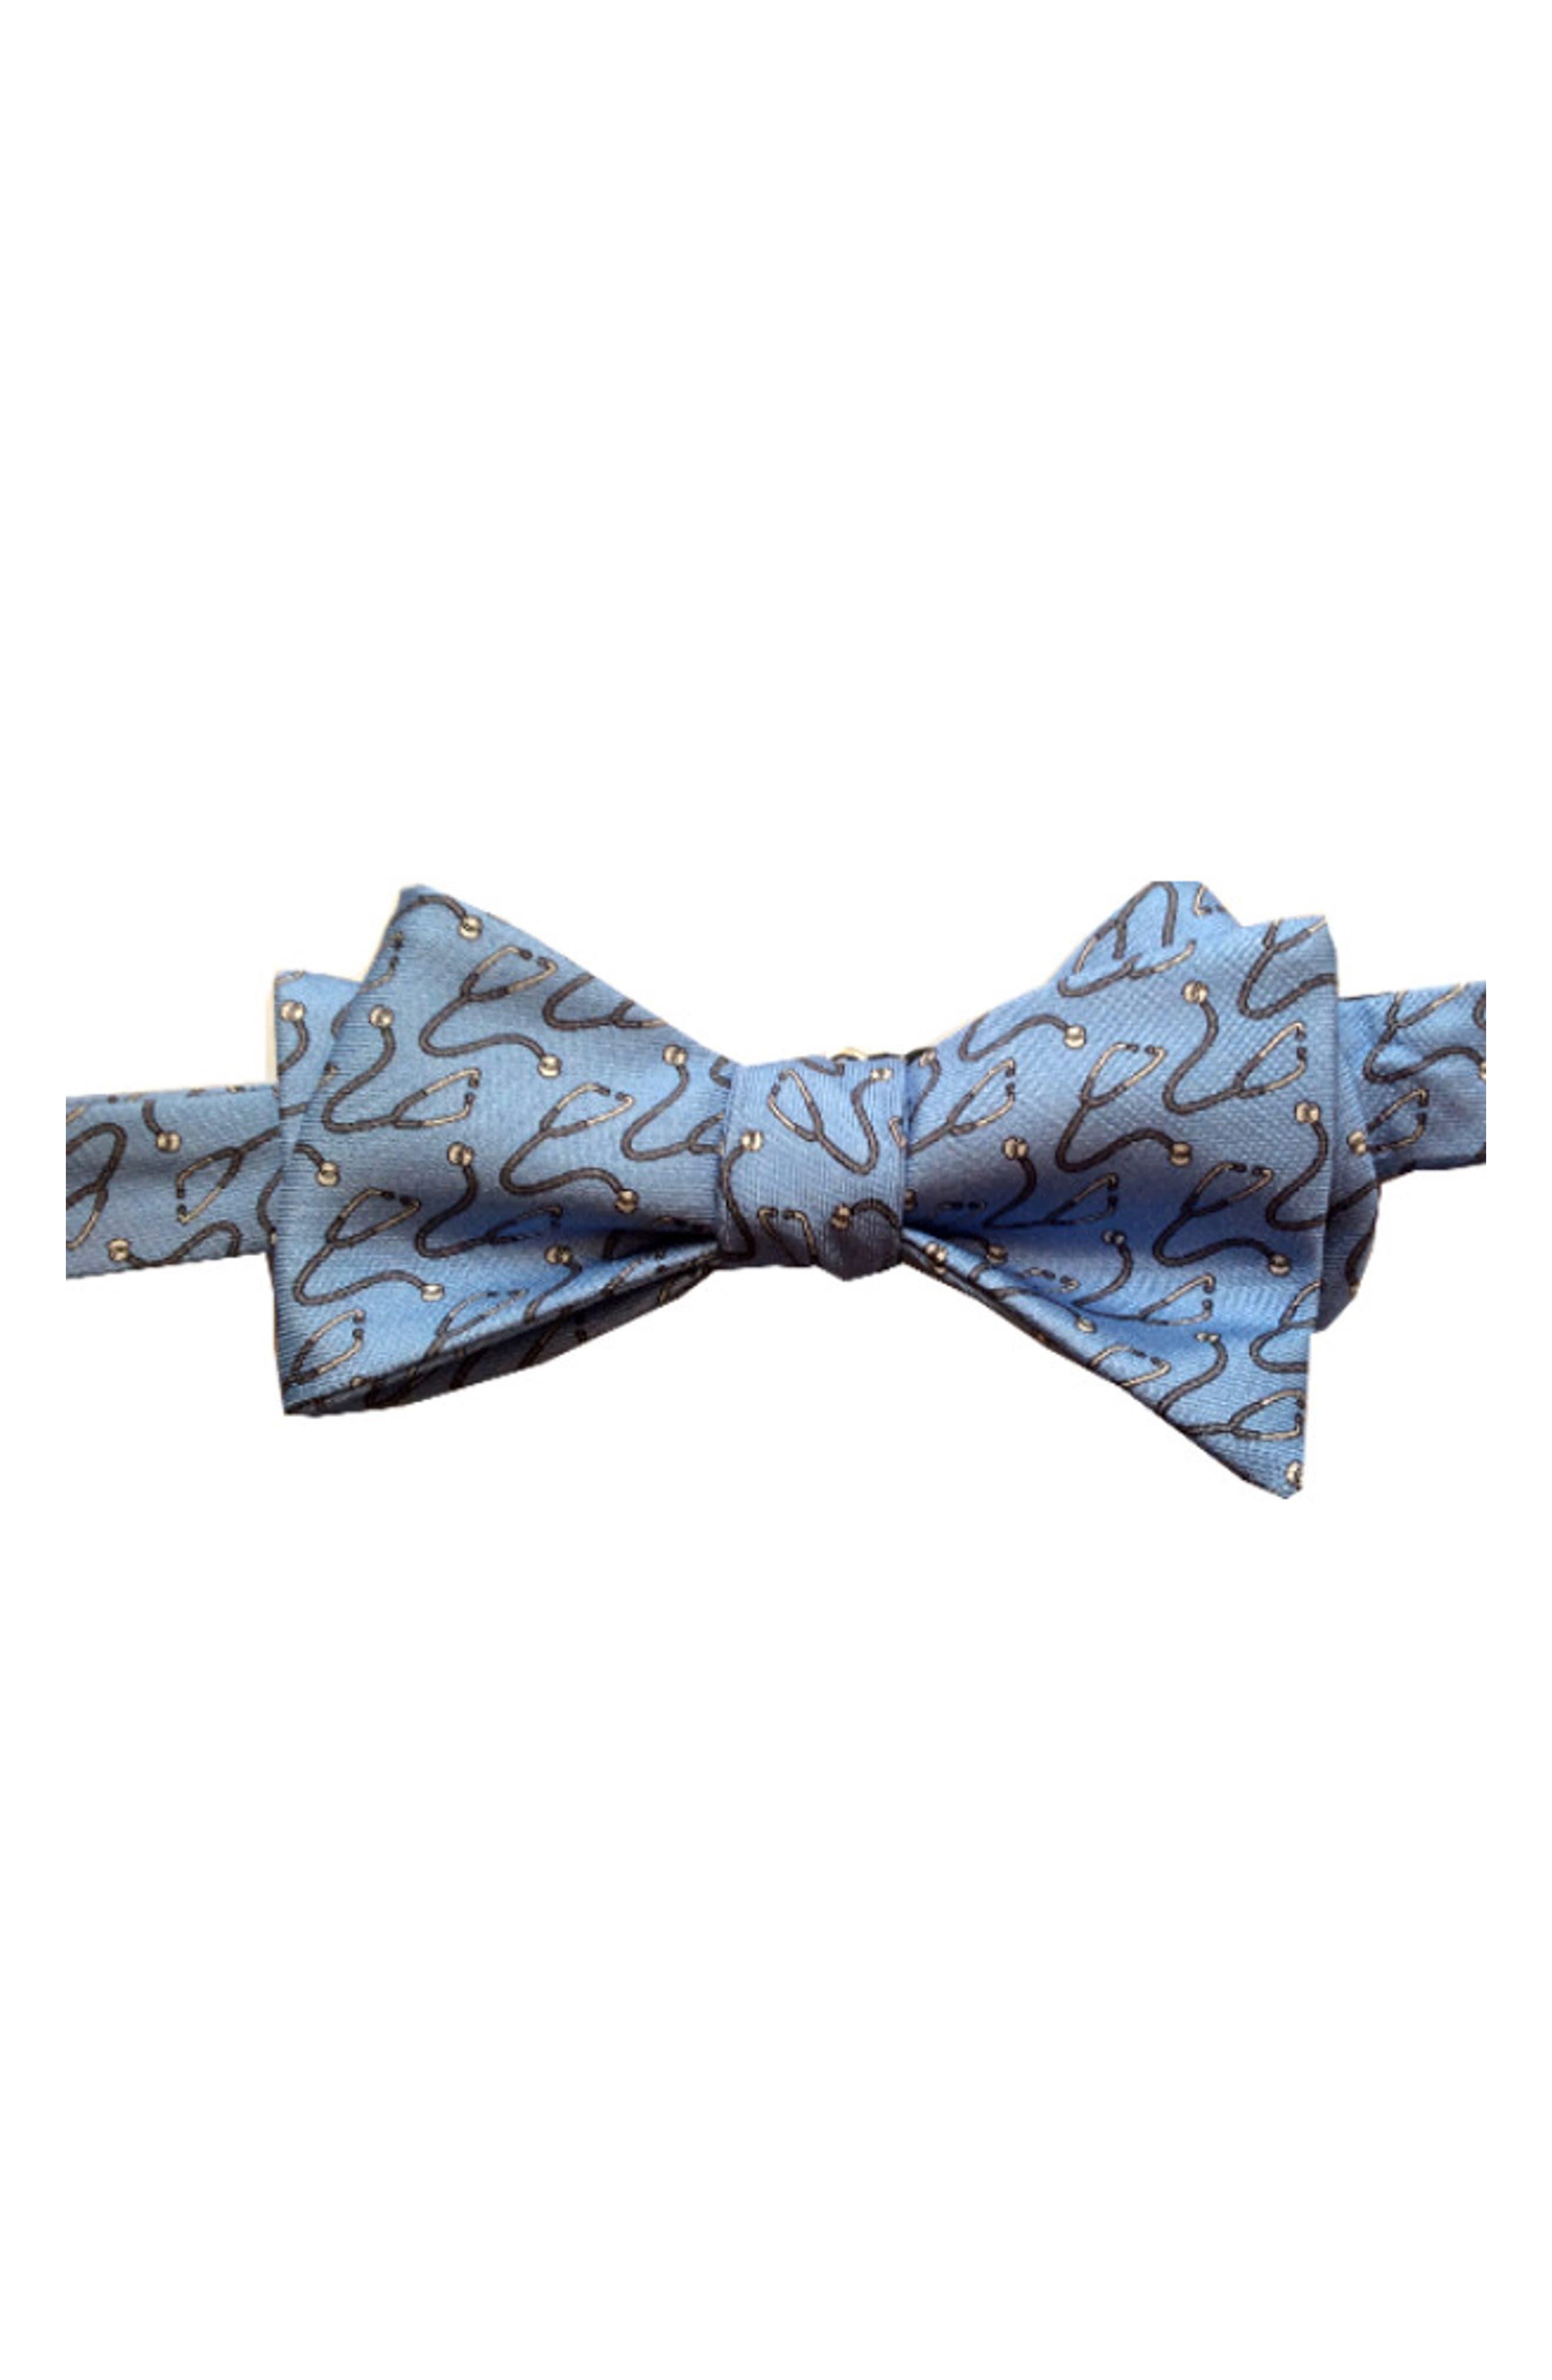 Doctor Silk Bow Tie,                         Main,                         color, LIGHT BLUE